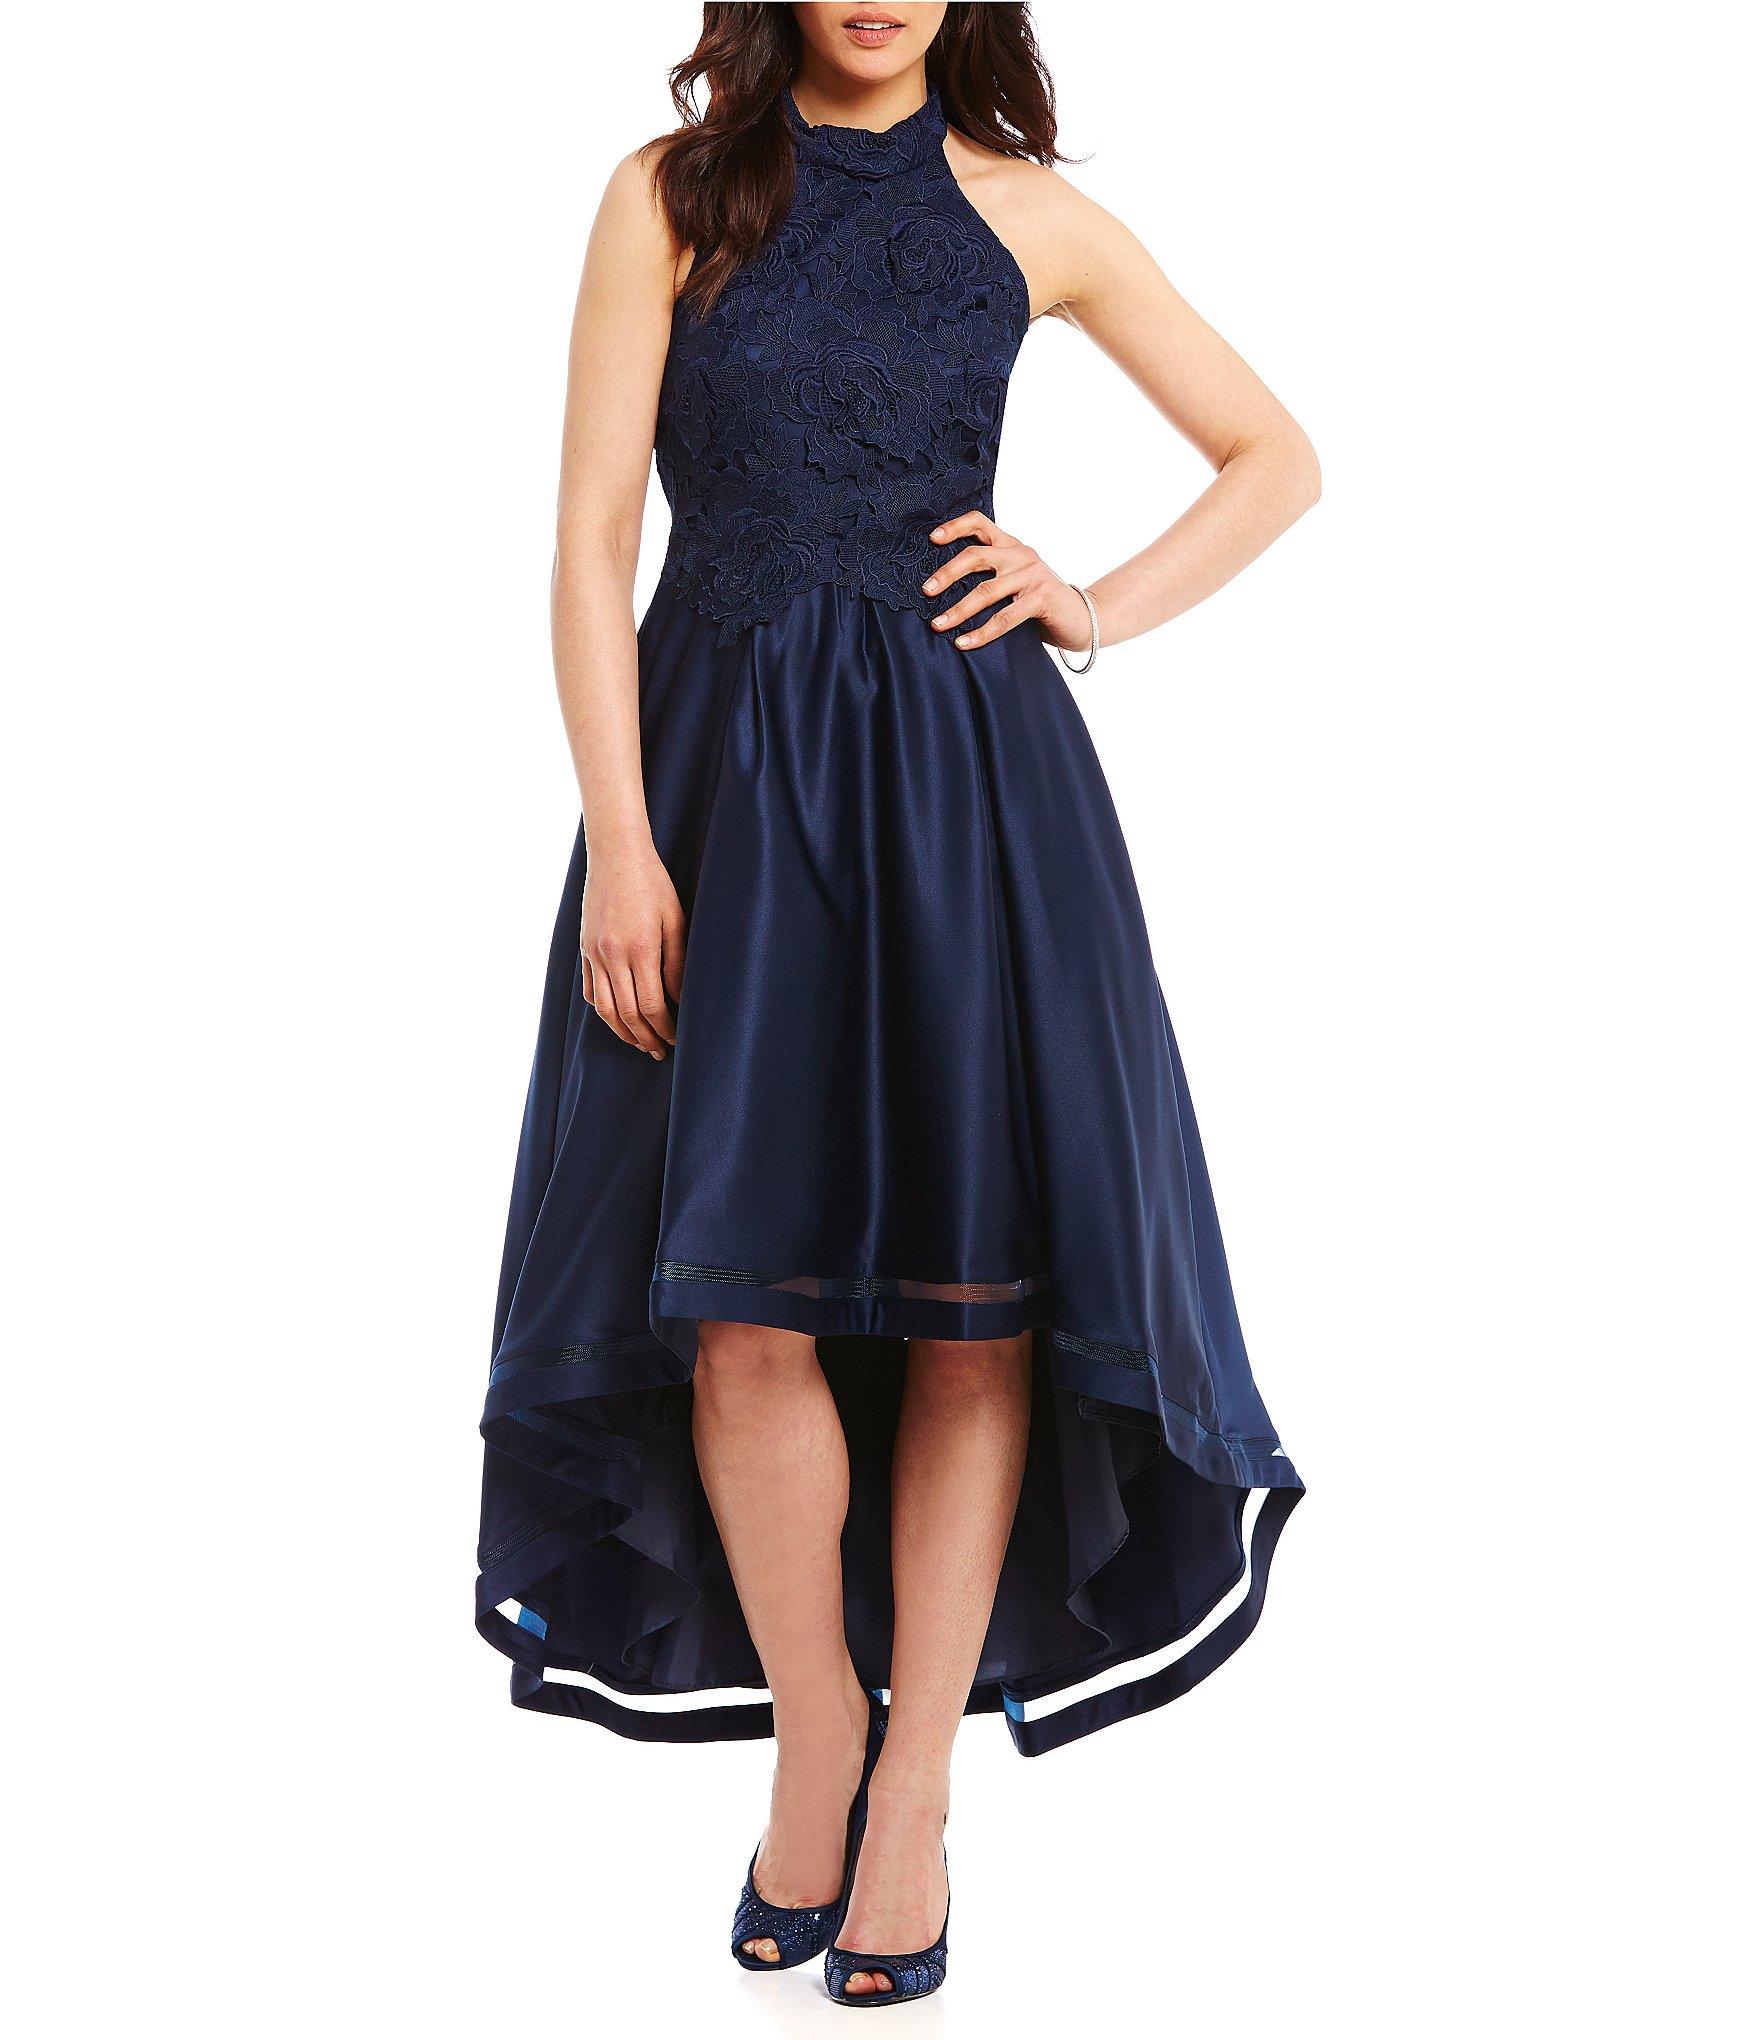 navy blue dress: womenu0027s clothing u0026 apparel | dillards.com hokapwh